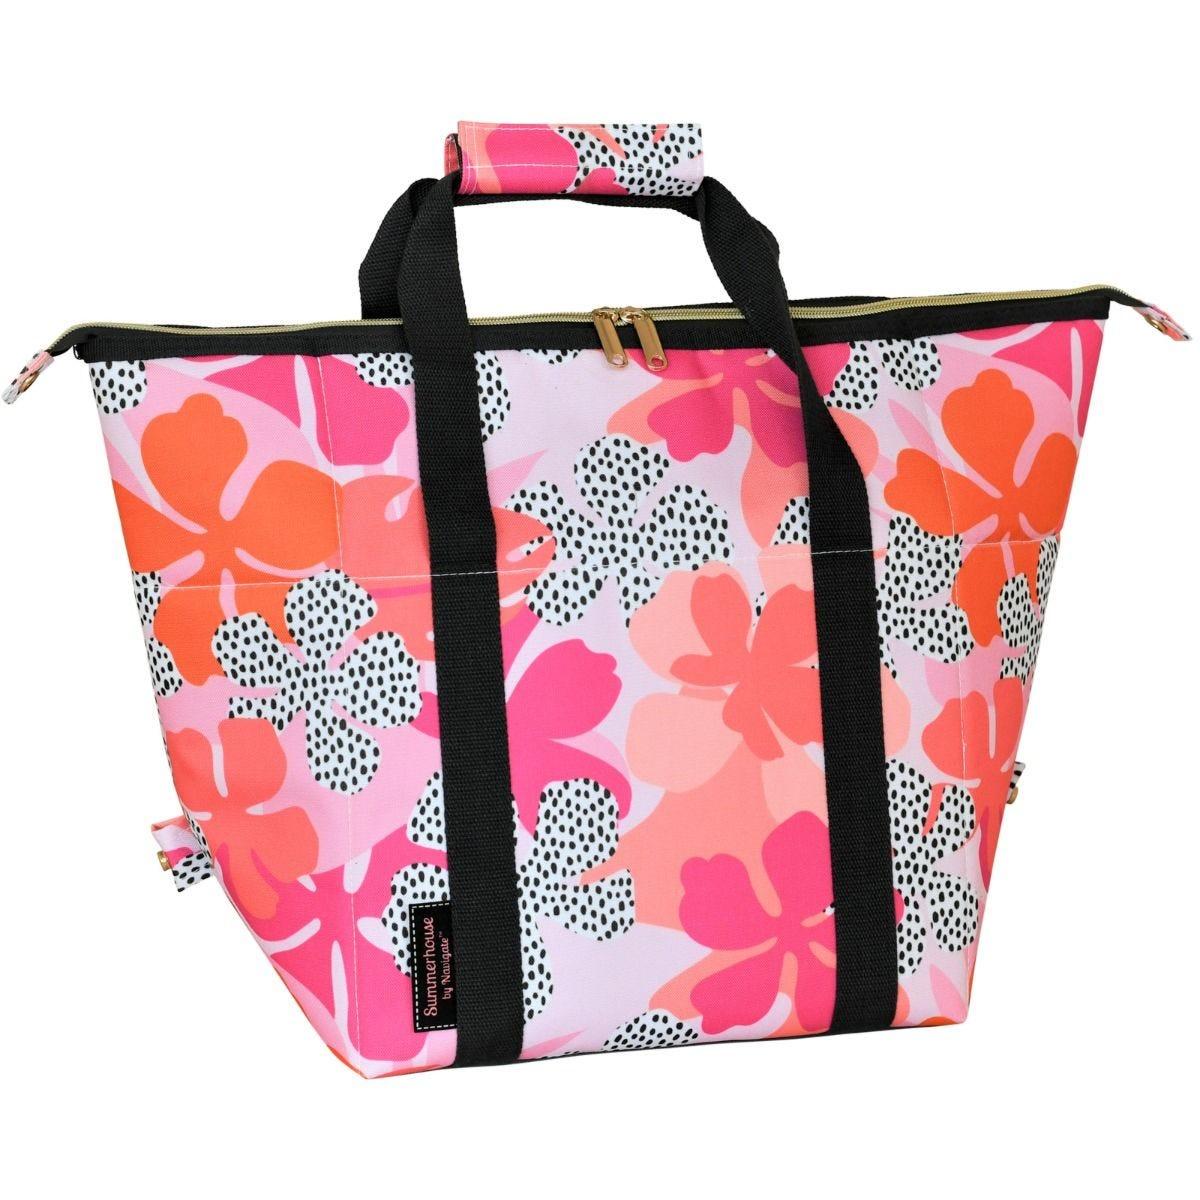 Summerhouse Tribal Fusion Floral 20L Convertible Cool Bag